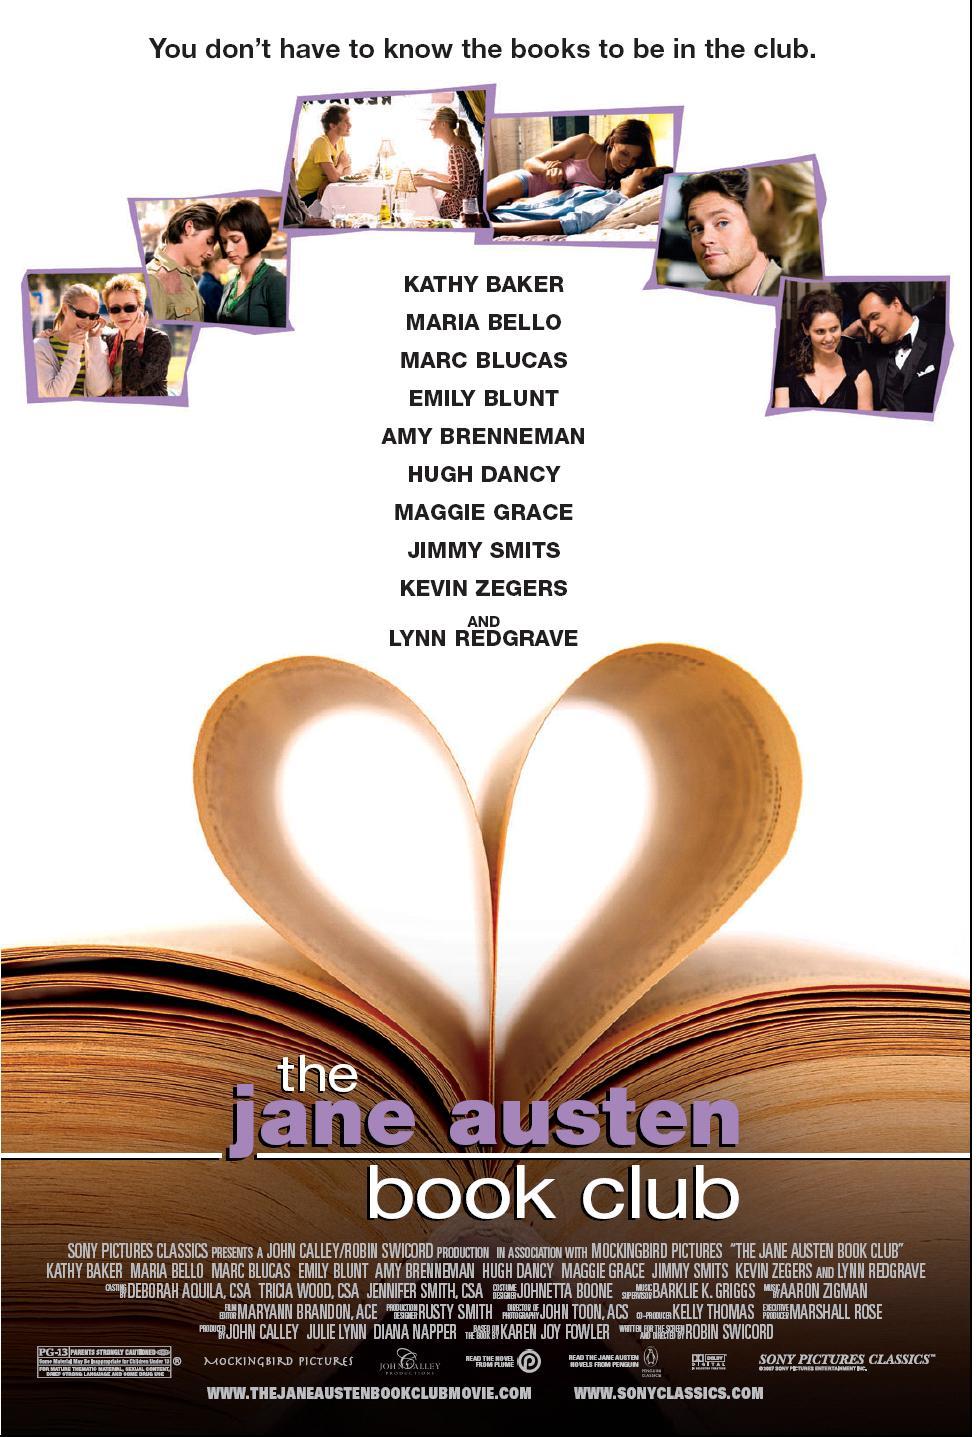 The Jane Austen Book Club starring Marc Blucas